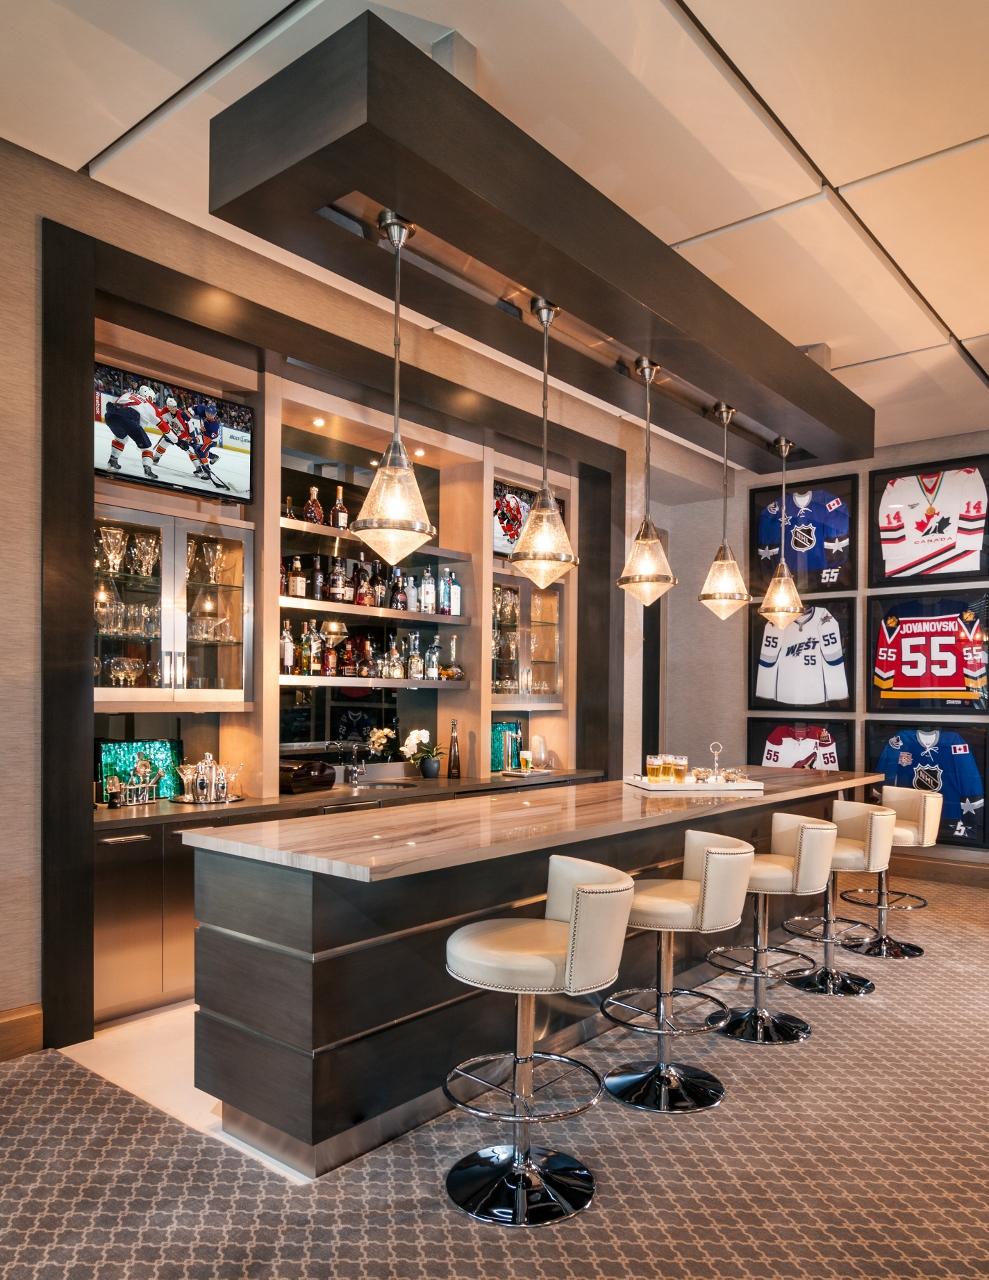 25 Sports Home Bar Design Ideas - Decoration Love